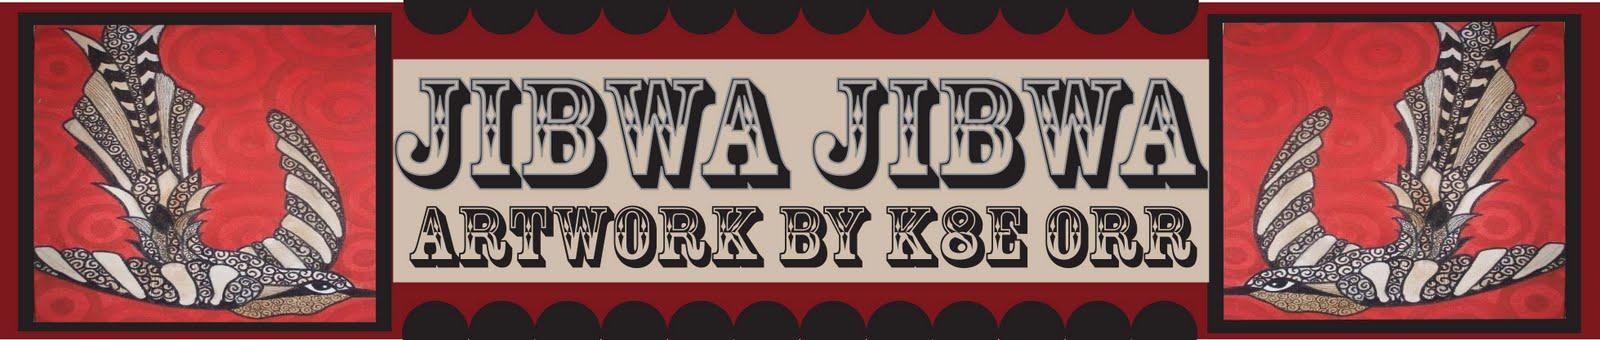 Jibwa-Jibwa